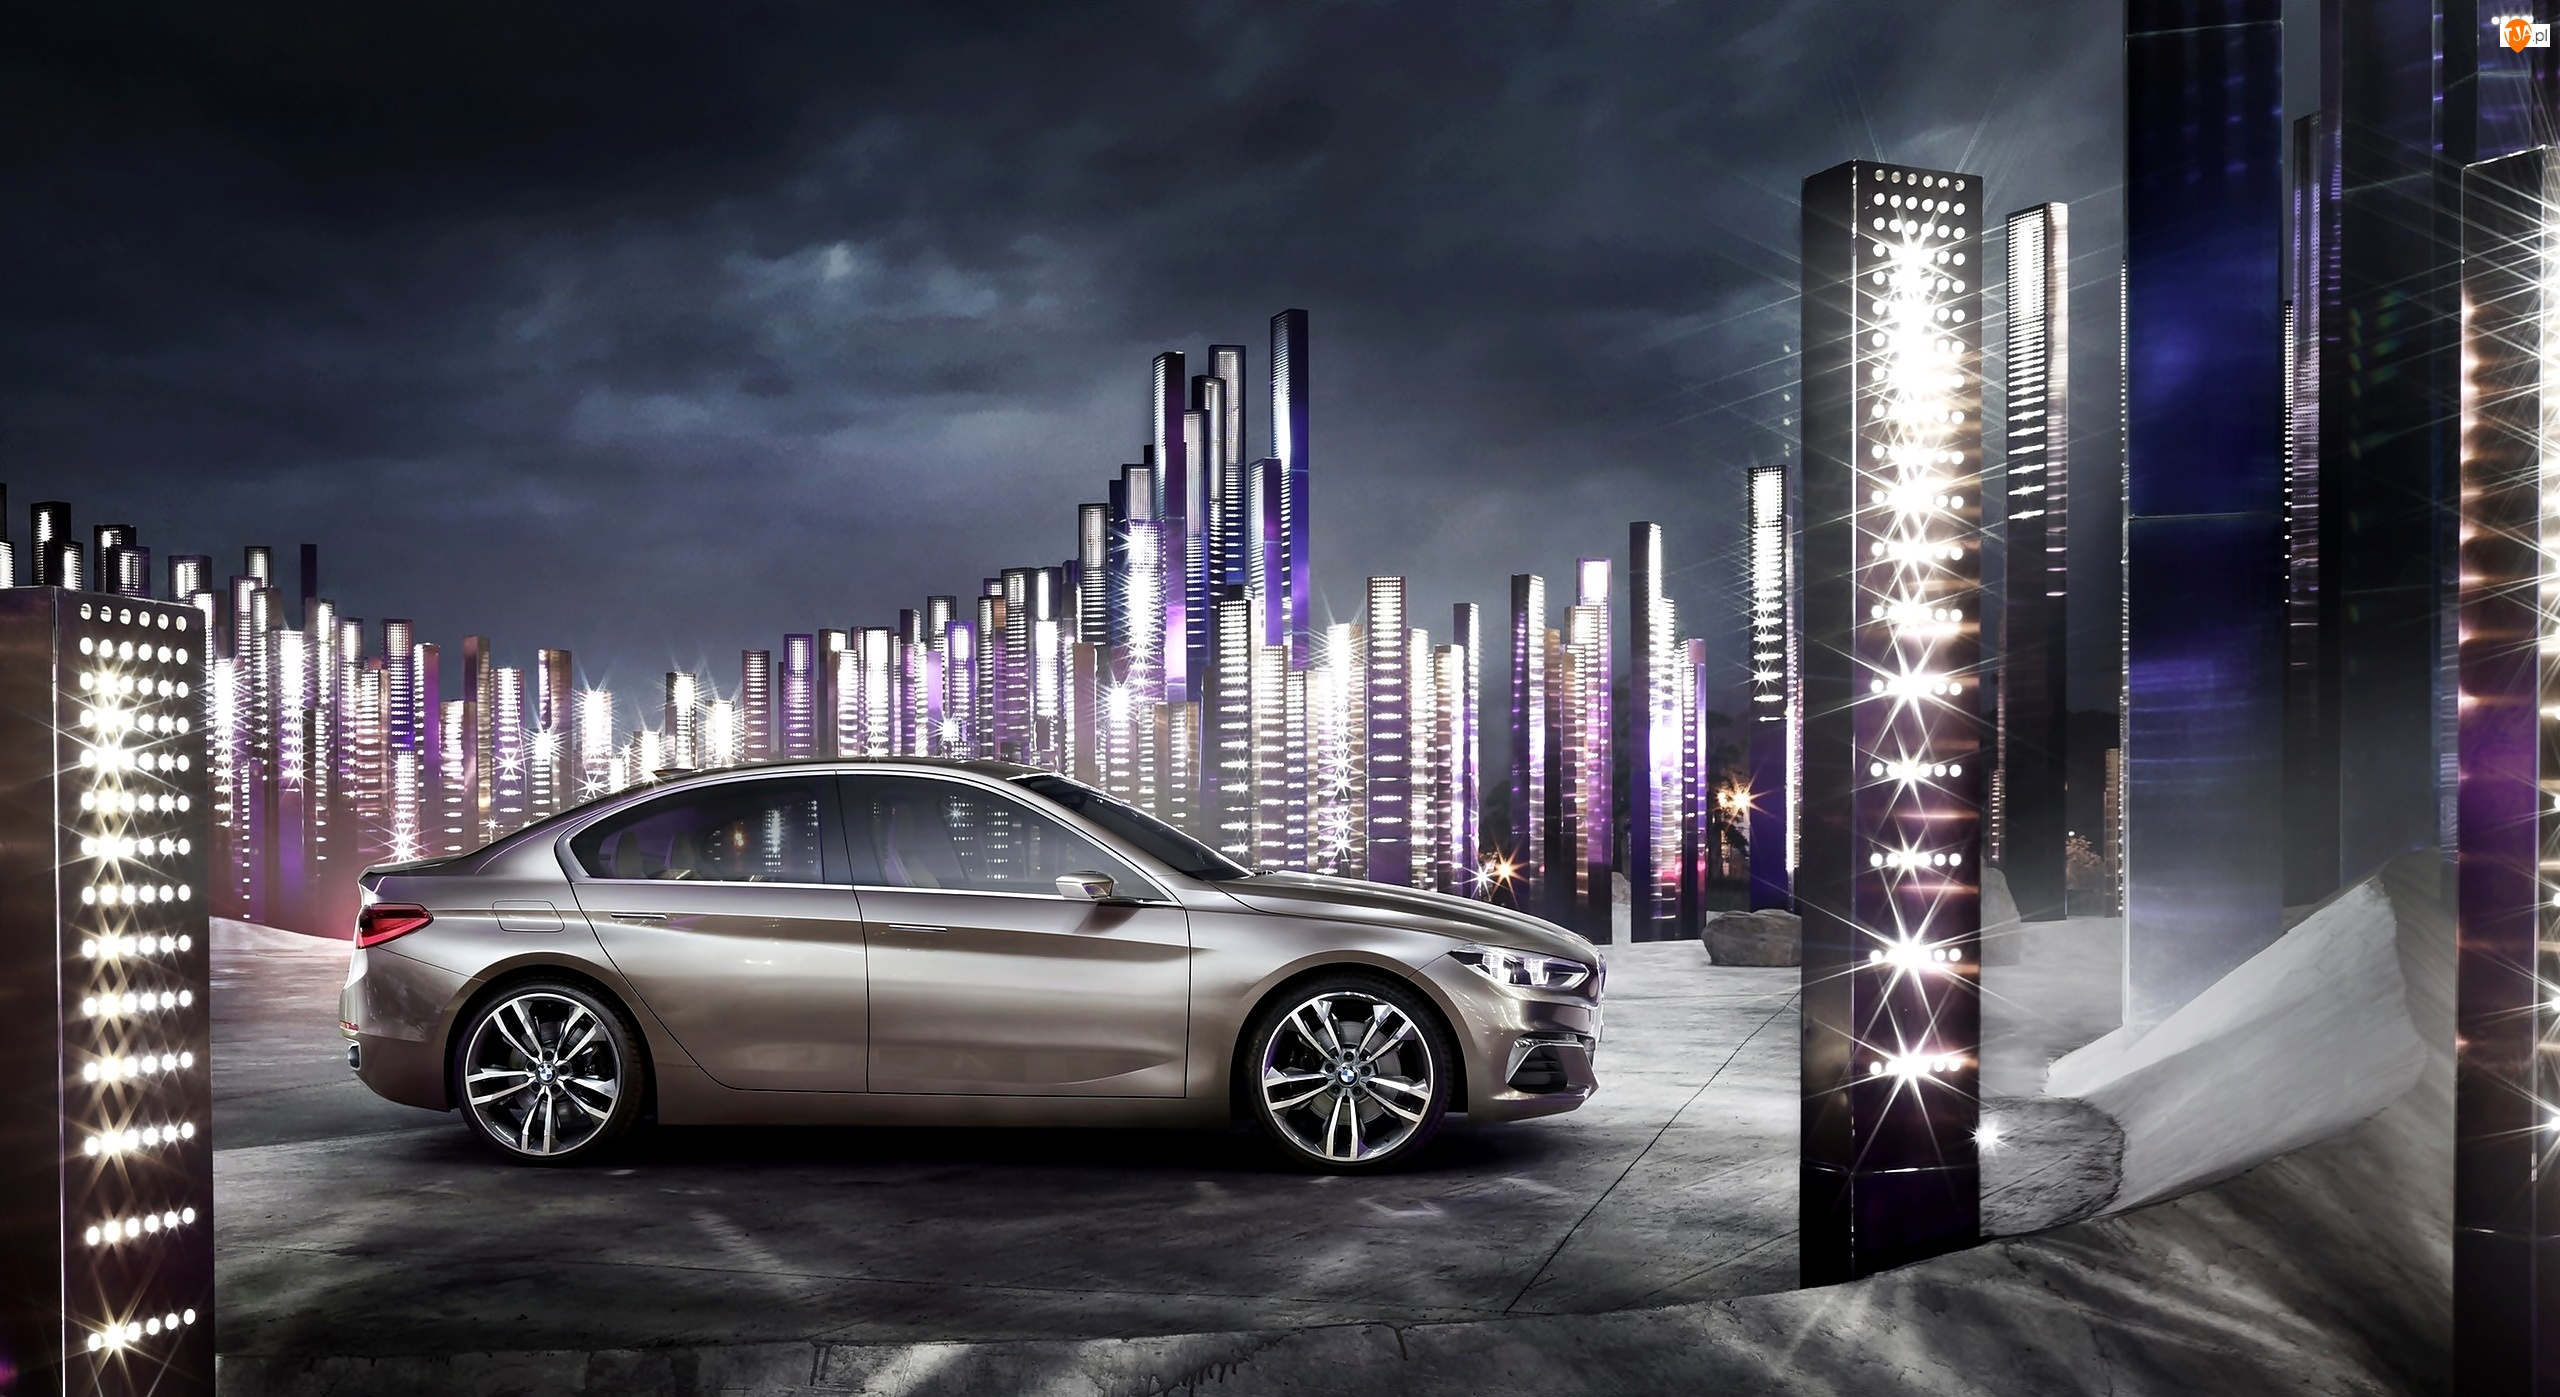 2015, BMW Compact Sedan, Concept